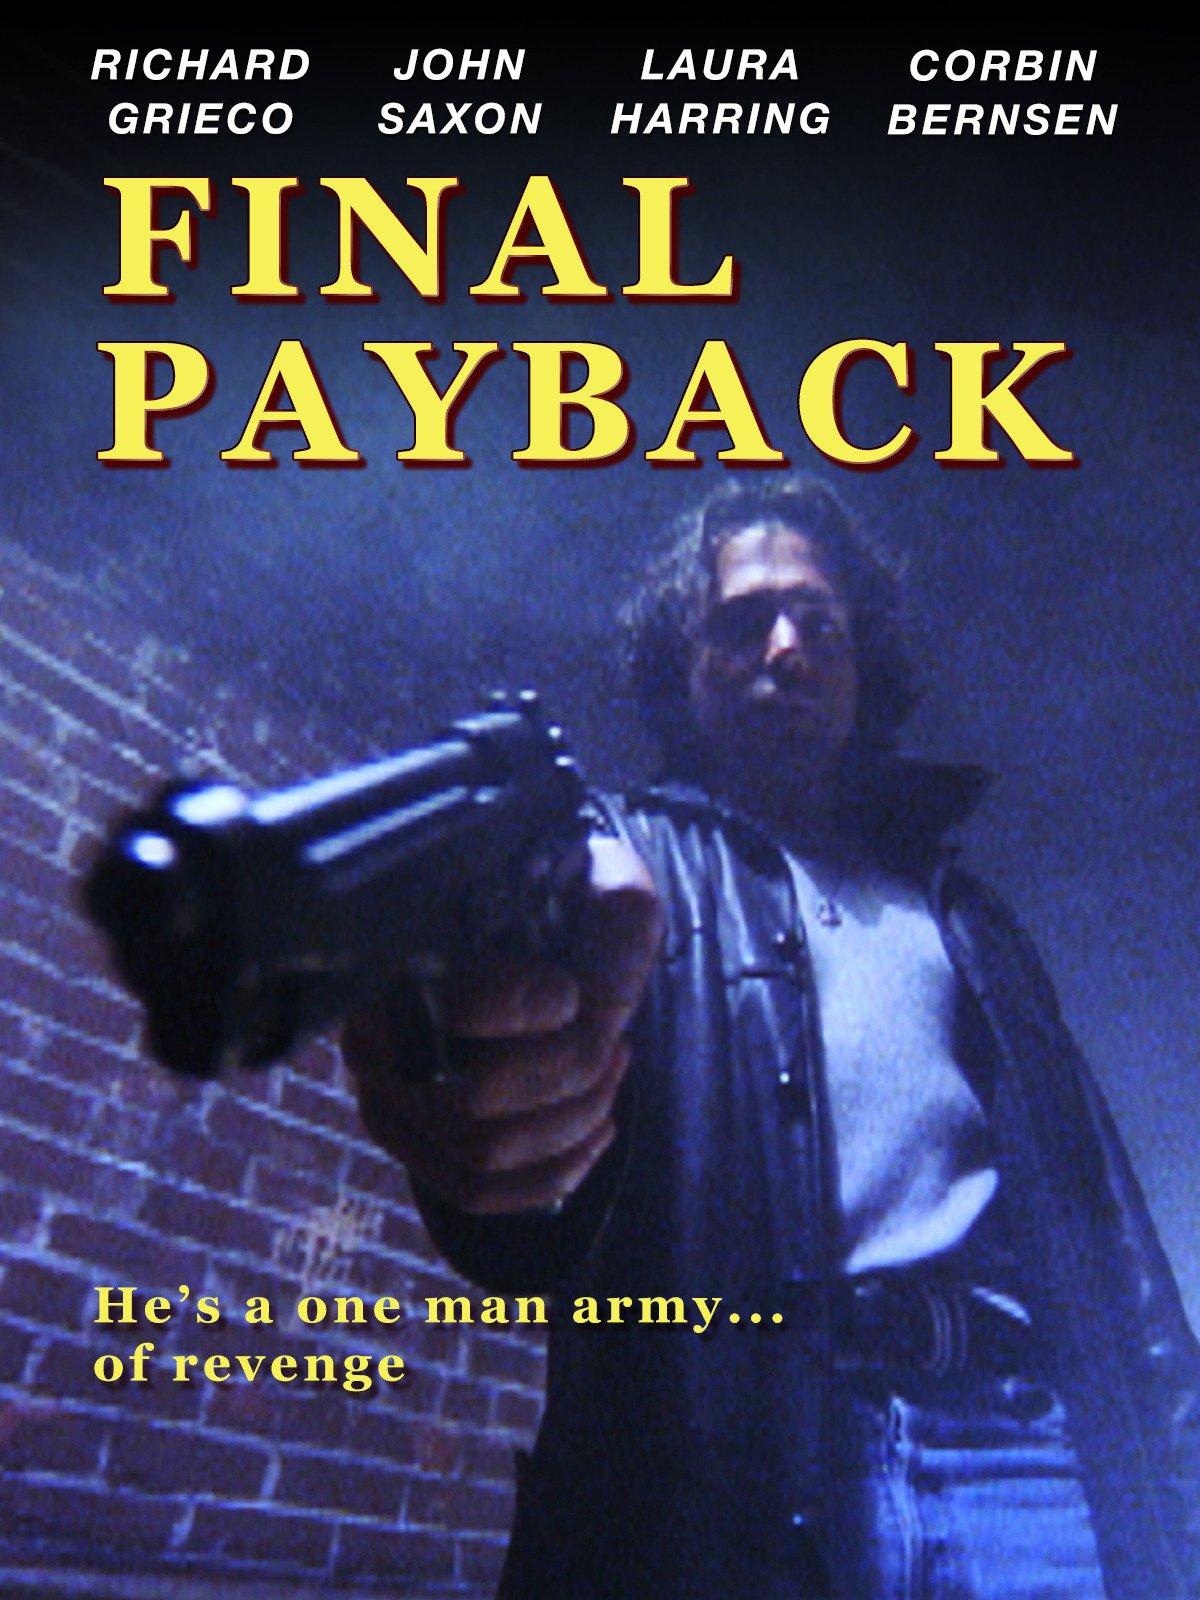 Final Payback